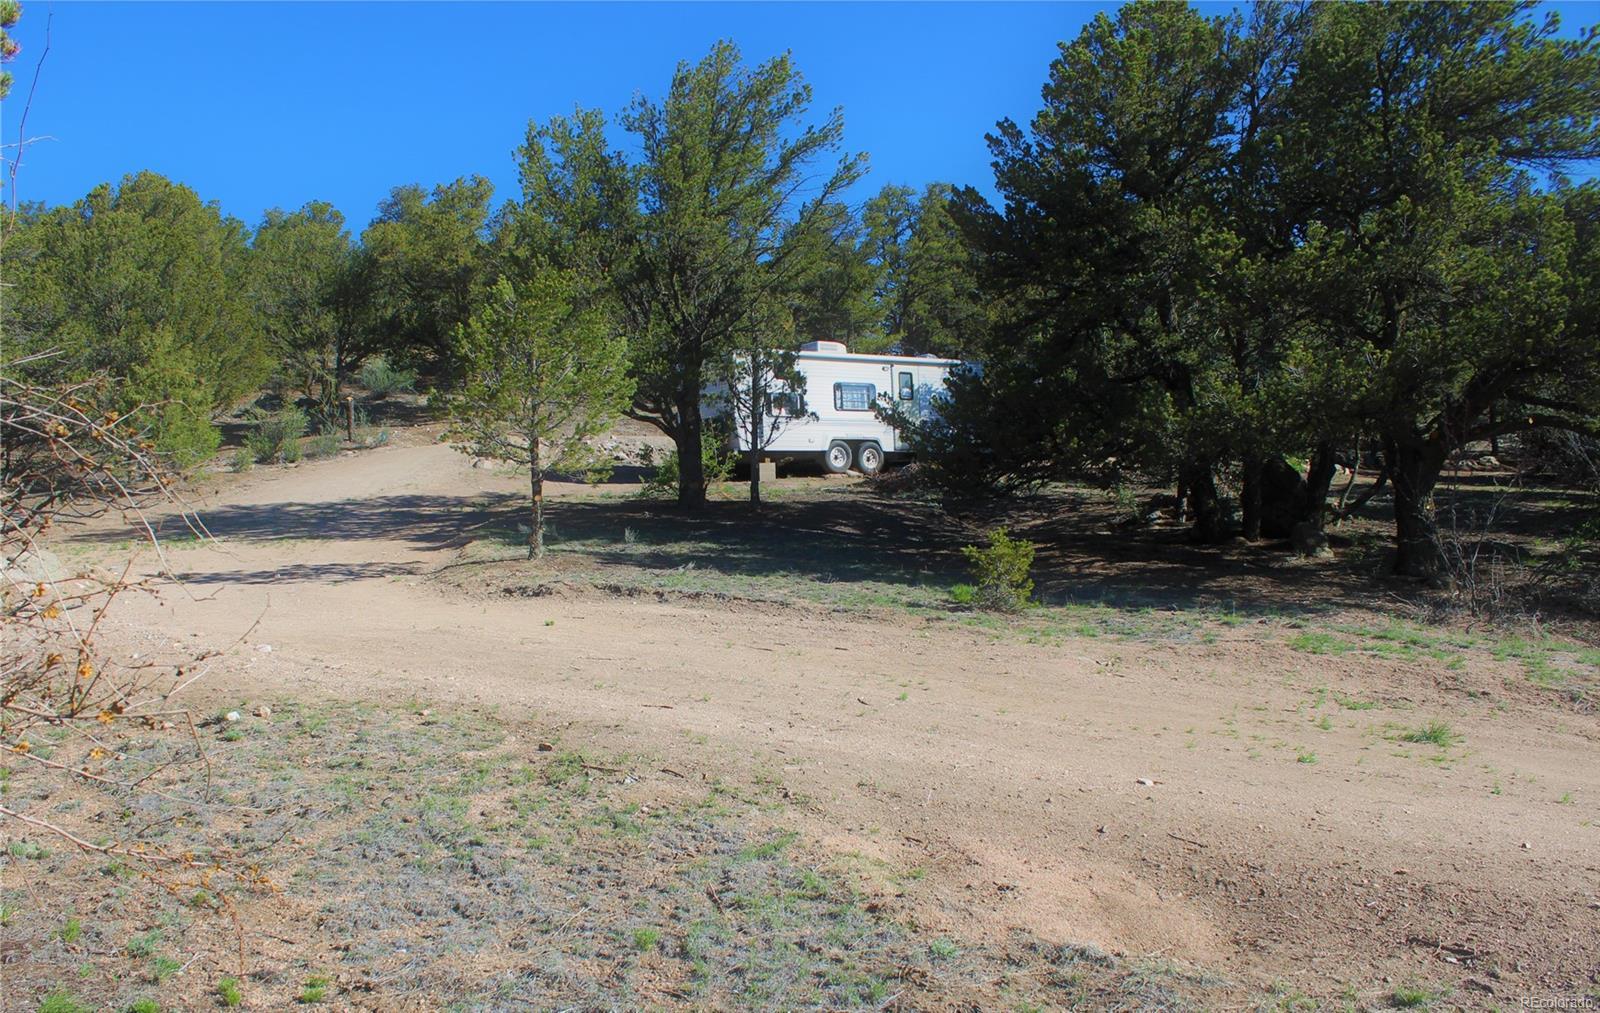 63 Fremont Drive, Cotopaxi, CO 81223 - Cotopaxi, CO real estate listing